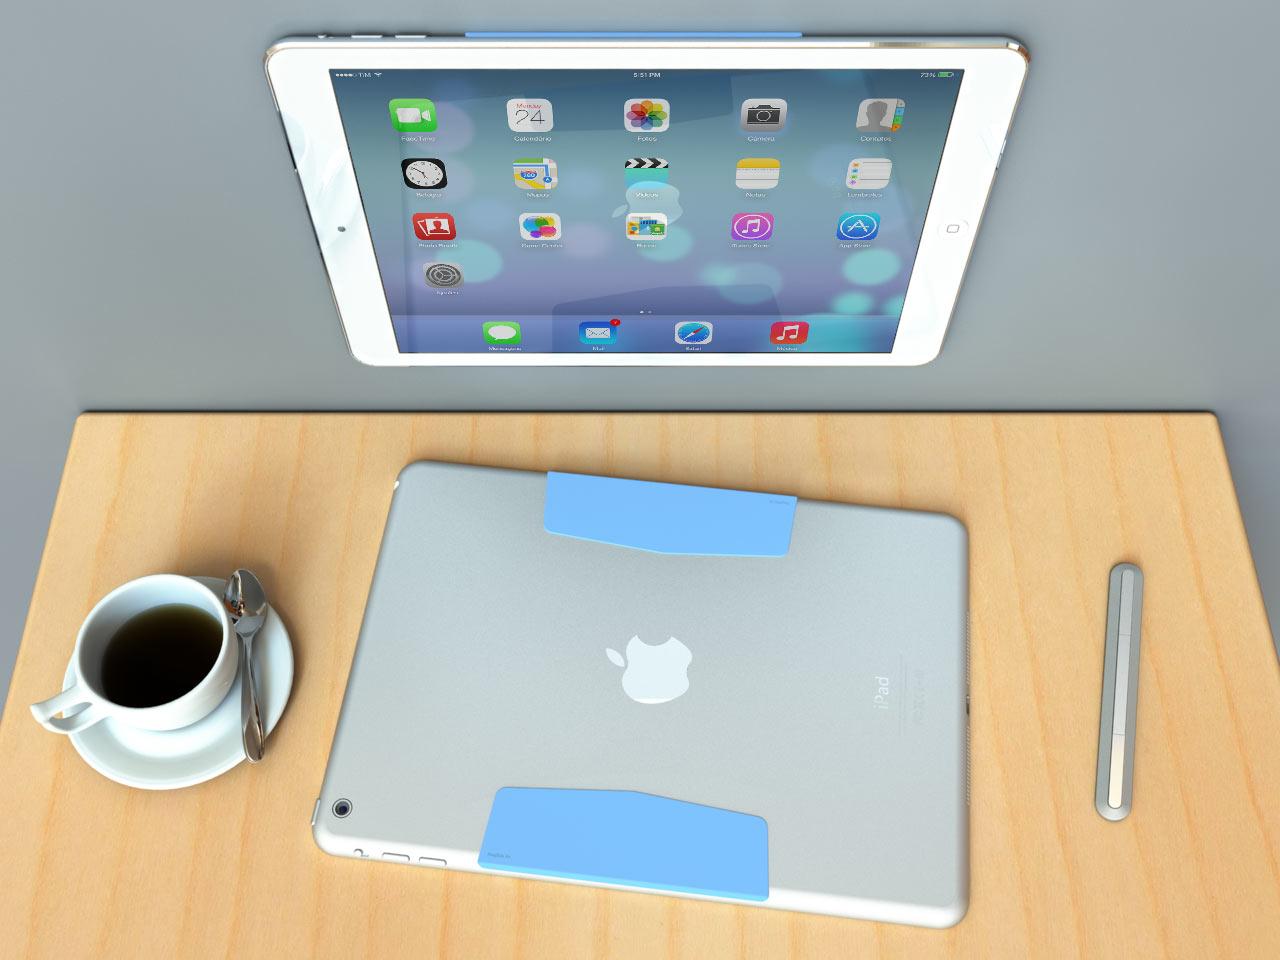 MagBak: World's Thinnest iPad Mount